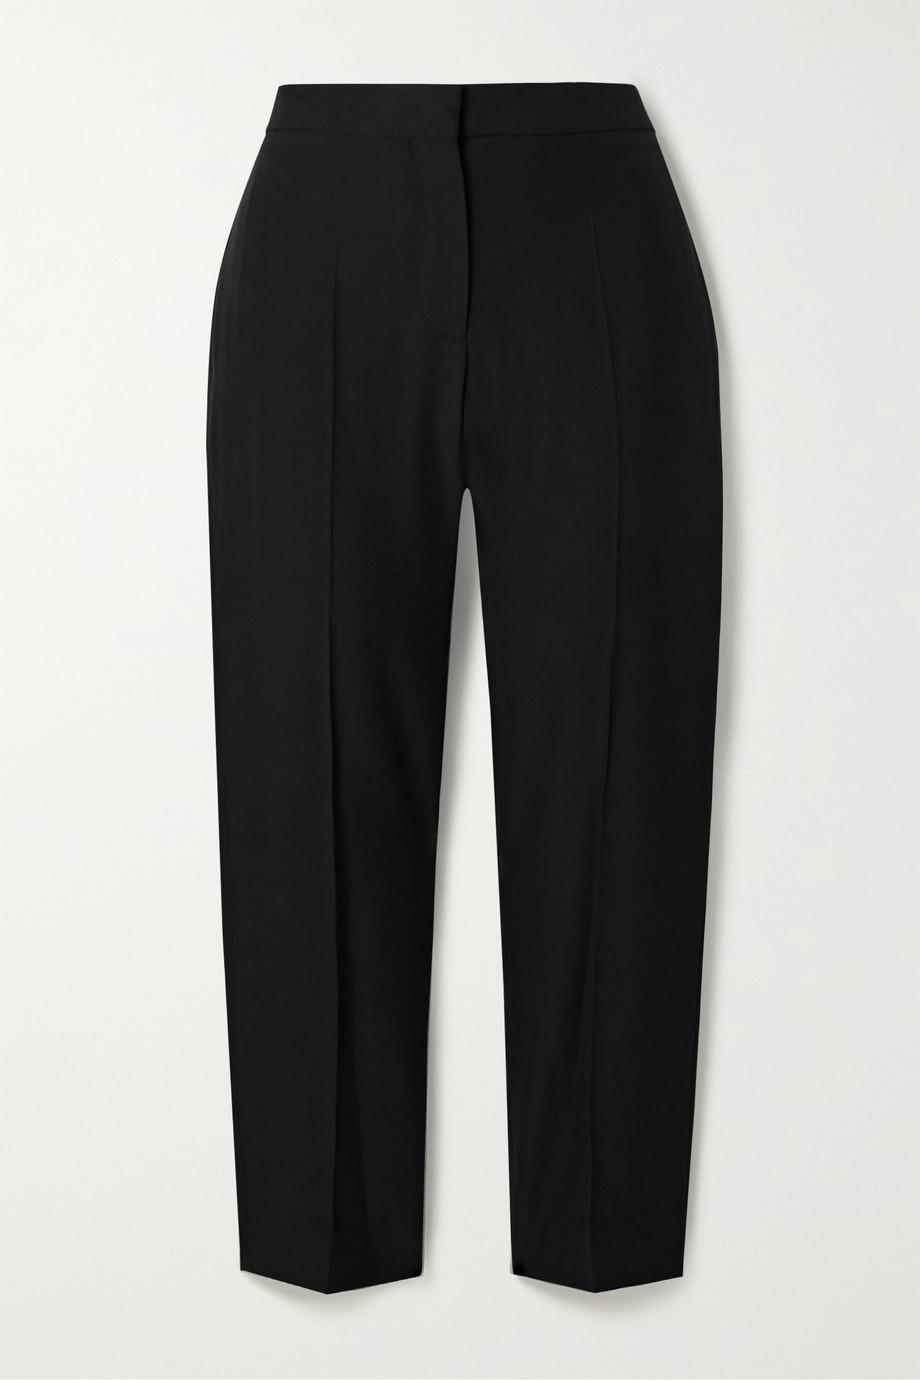 Alexander McQueen Cropped woven straight-leg pants